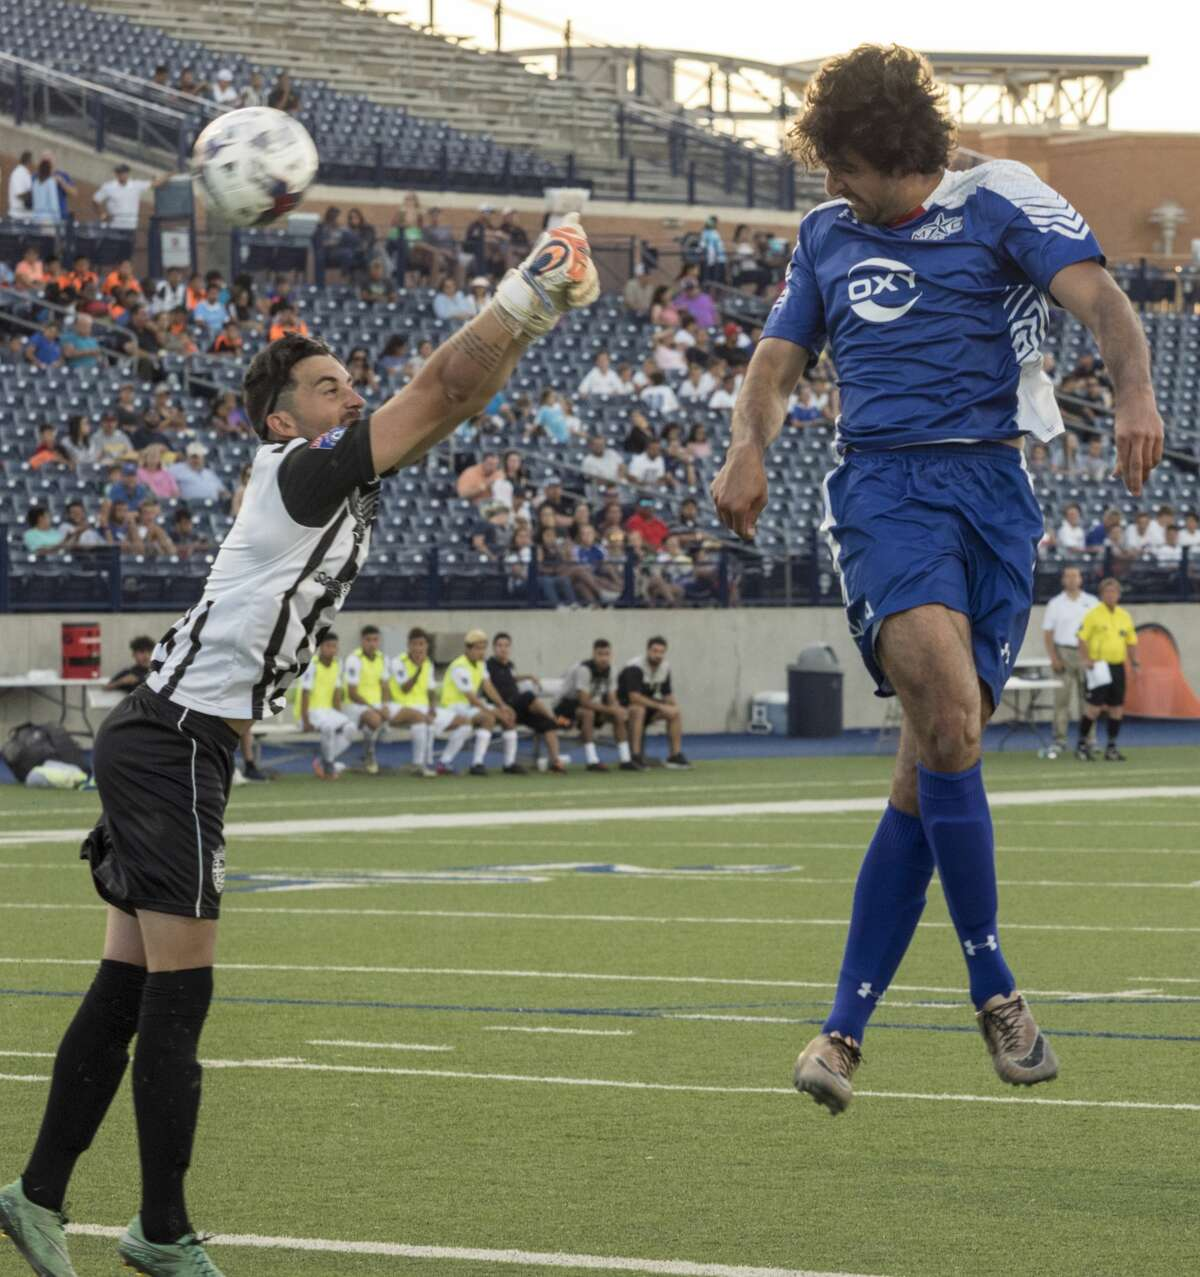 Midland-Odessa FC's Ricardo Palomino attempts to head the ball past Houston Regals' goalkeeper, Gonzalo Santa 5/18/17 in the season opener at Grande Communications Stadium. Tim Fischer/Reporter-Telegram